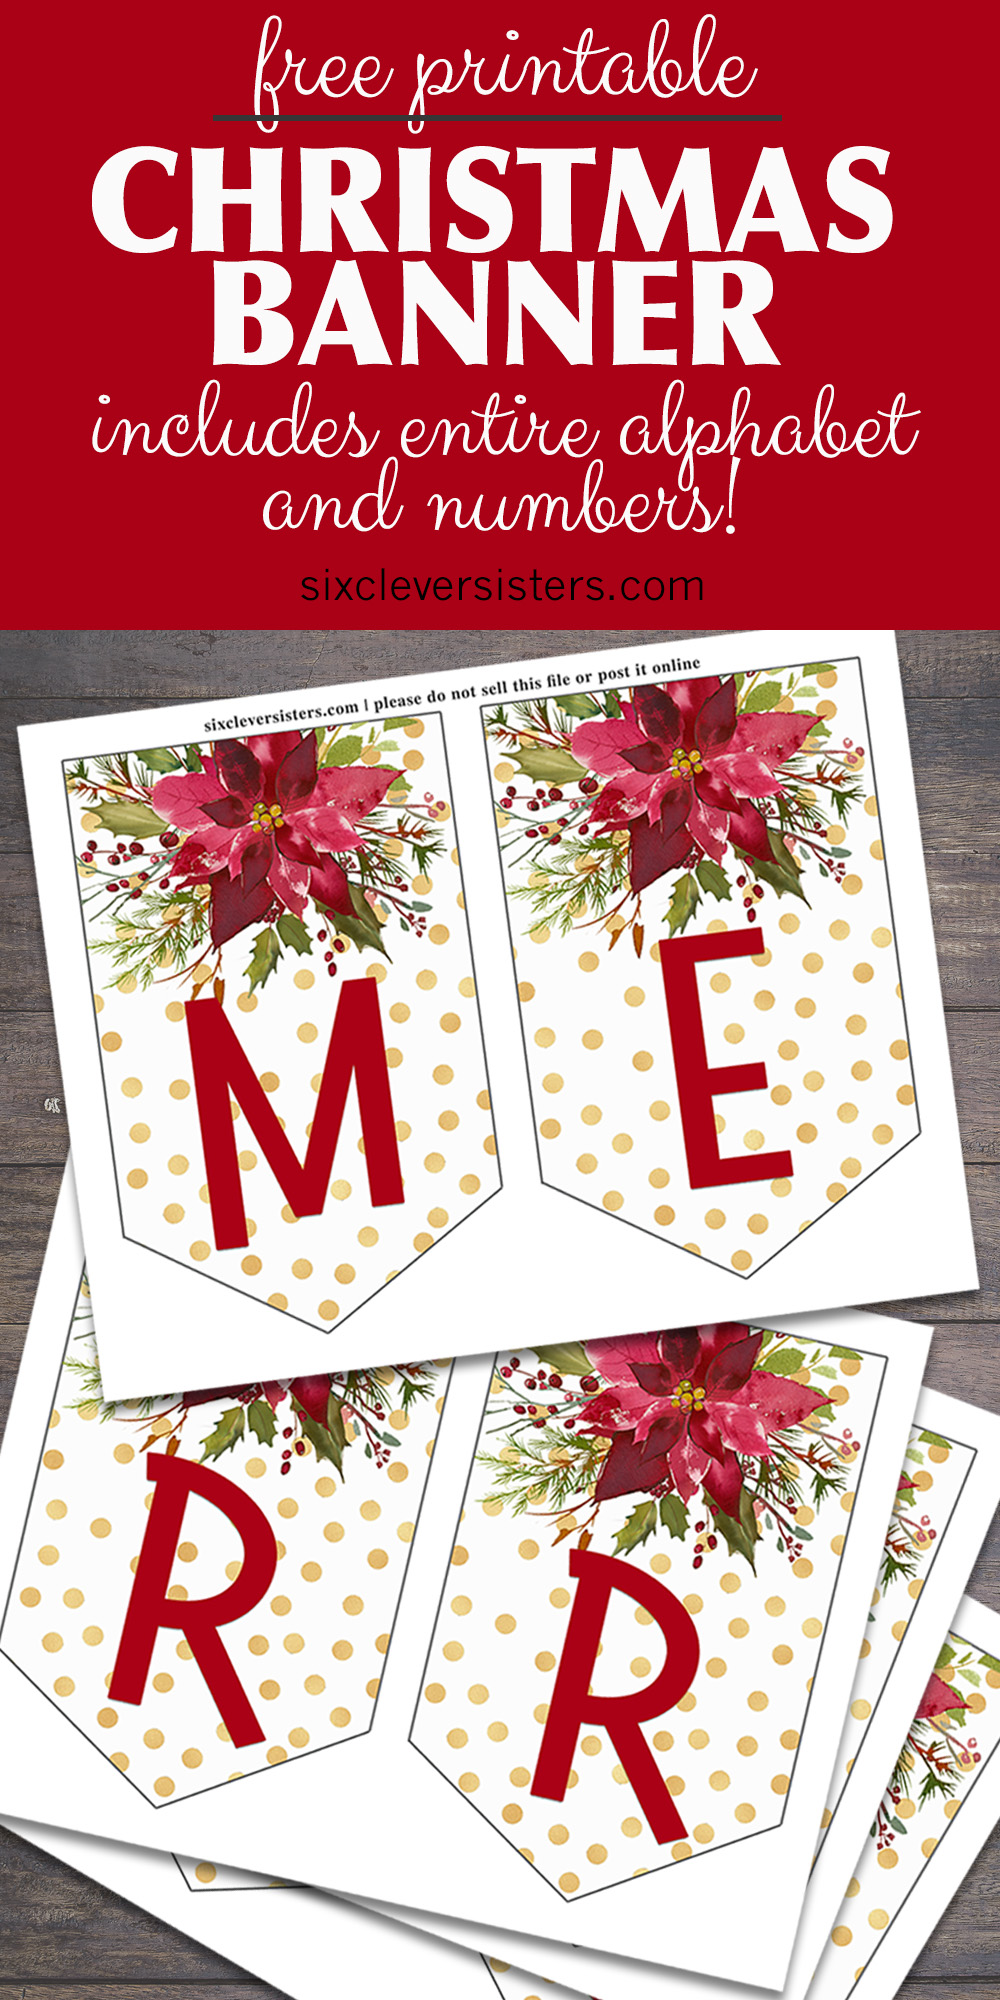 graphic regarding Merry Christmas Letters Printable identify Printable Xmas Banner - 6 Good Sisters